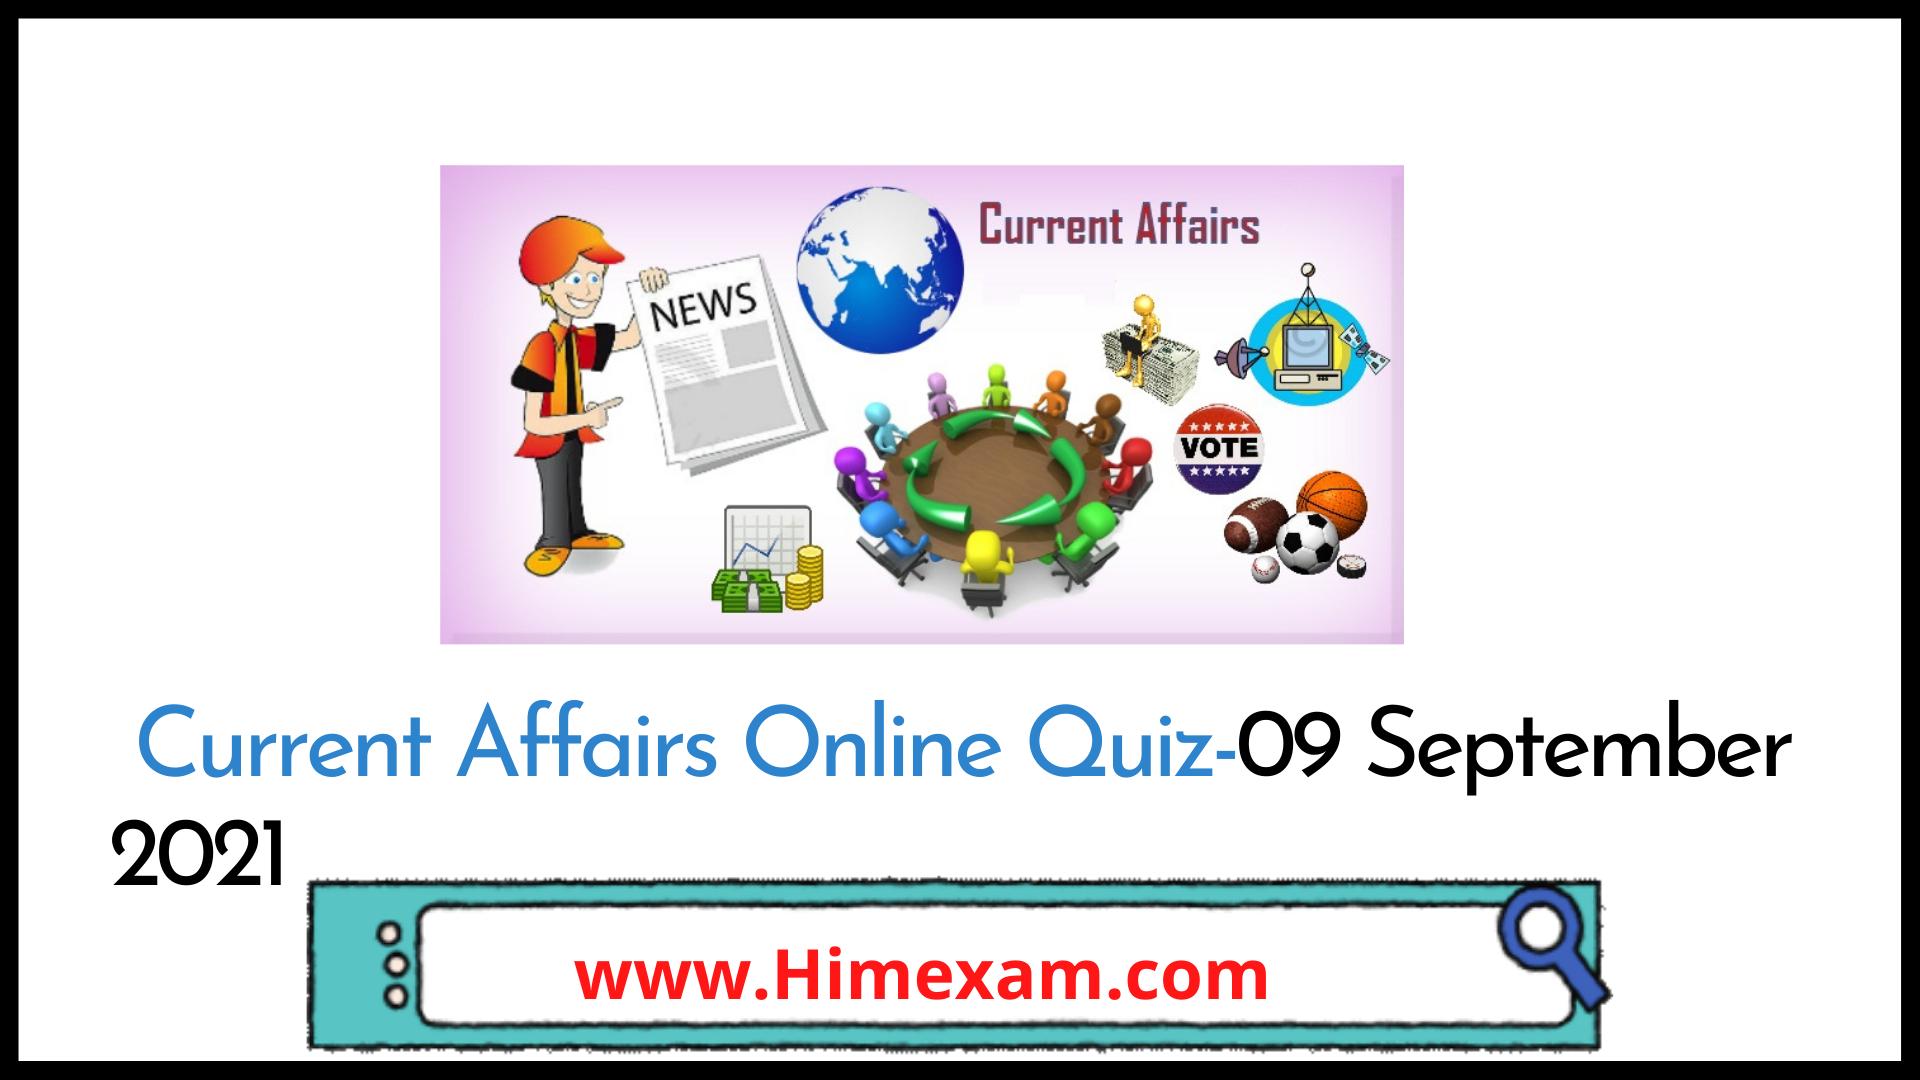 Current Affairs Online Quiz-09 September 2021